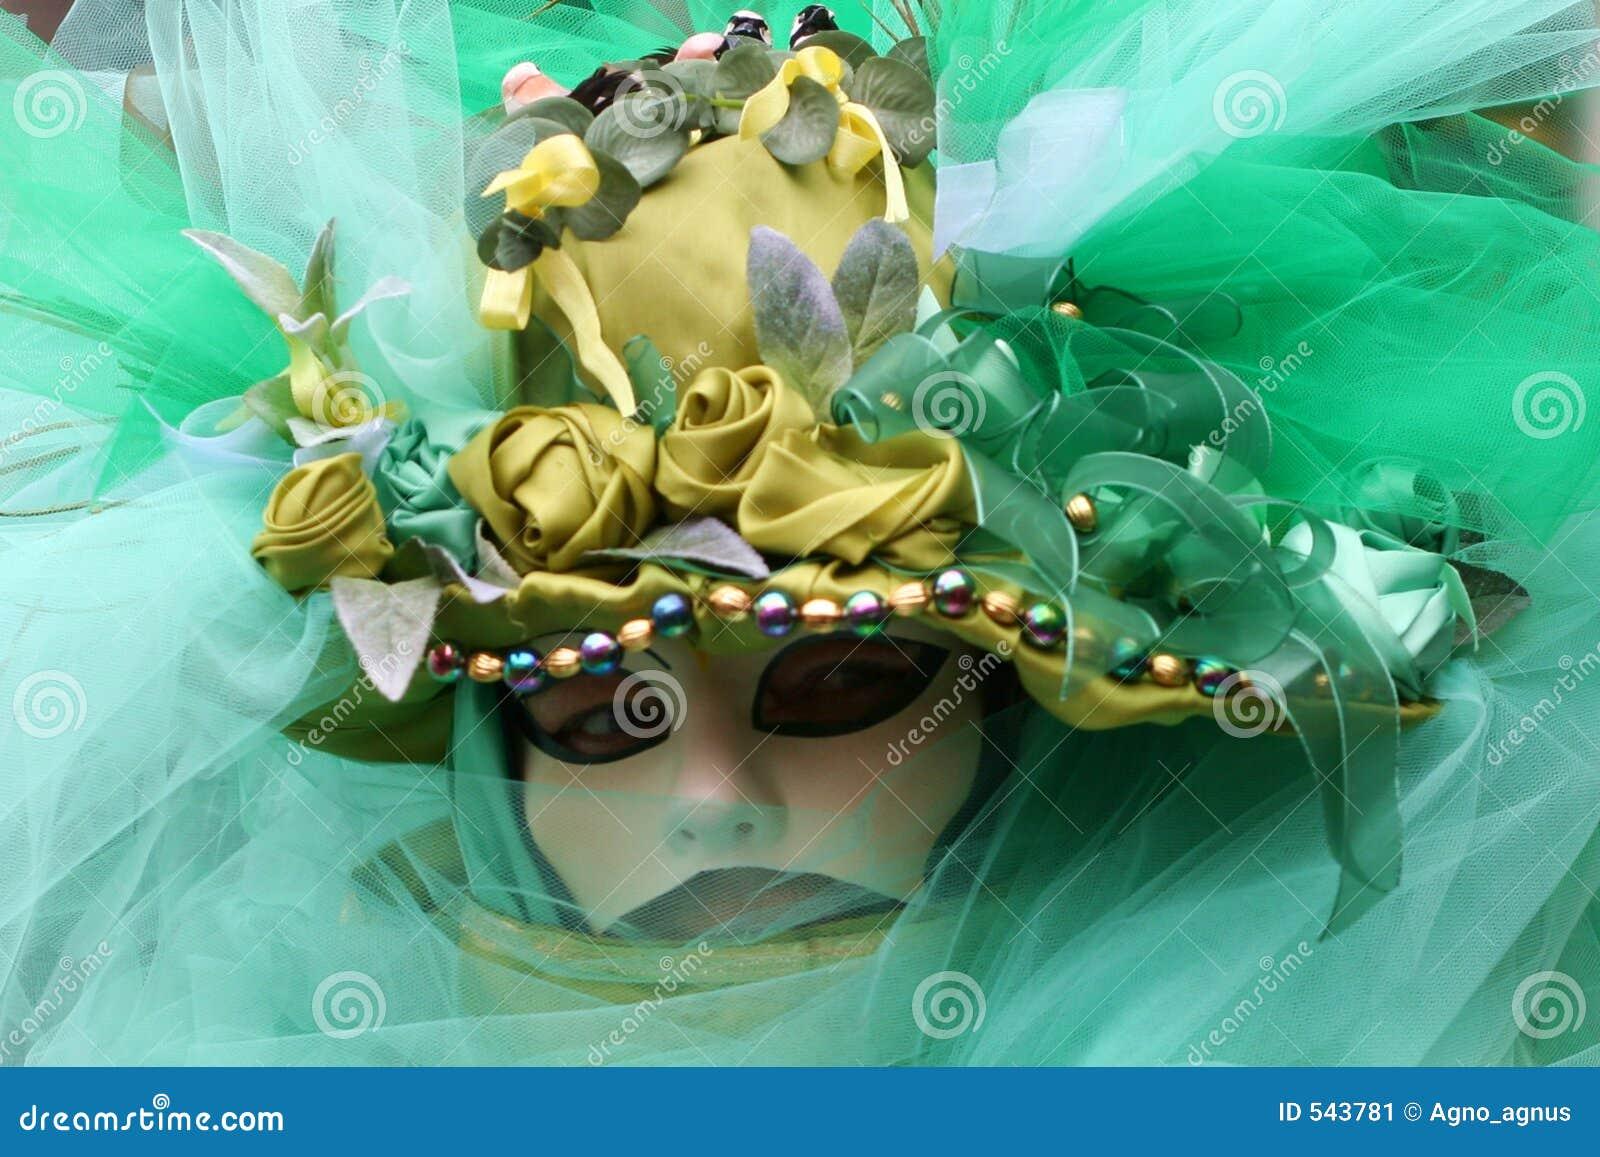 Download 狂欢节意大利屏蔽威尼斯 库存图片. 图片 包括有 意大利语, fest, 隐藏, 颜色, 创建者, 屏蔽, 戏曲 - 543781